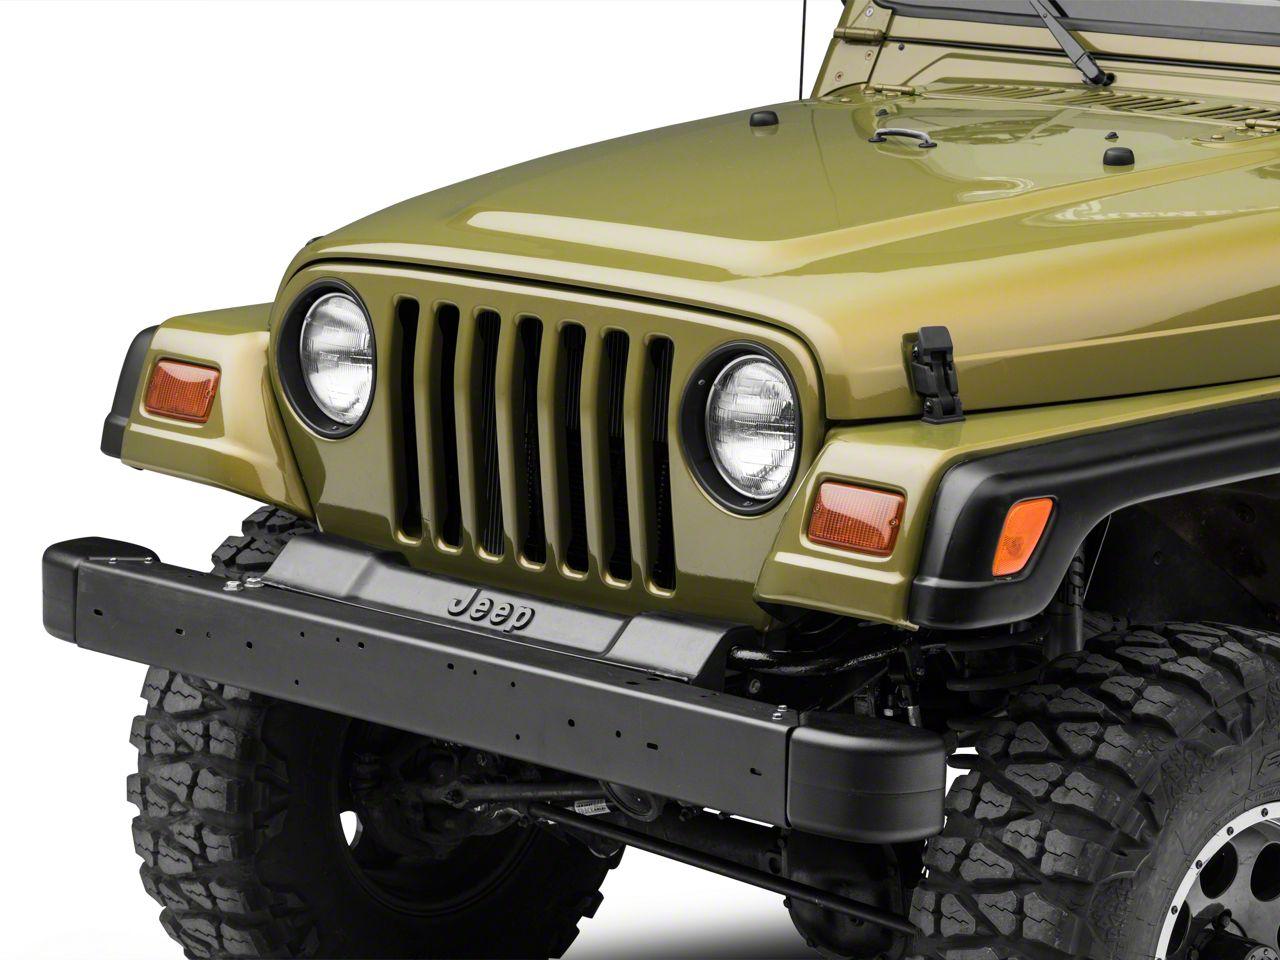 Omix-ADA Front Bumper Kit - Black (97-06 Jeep Wrangler TJ)